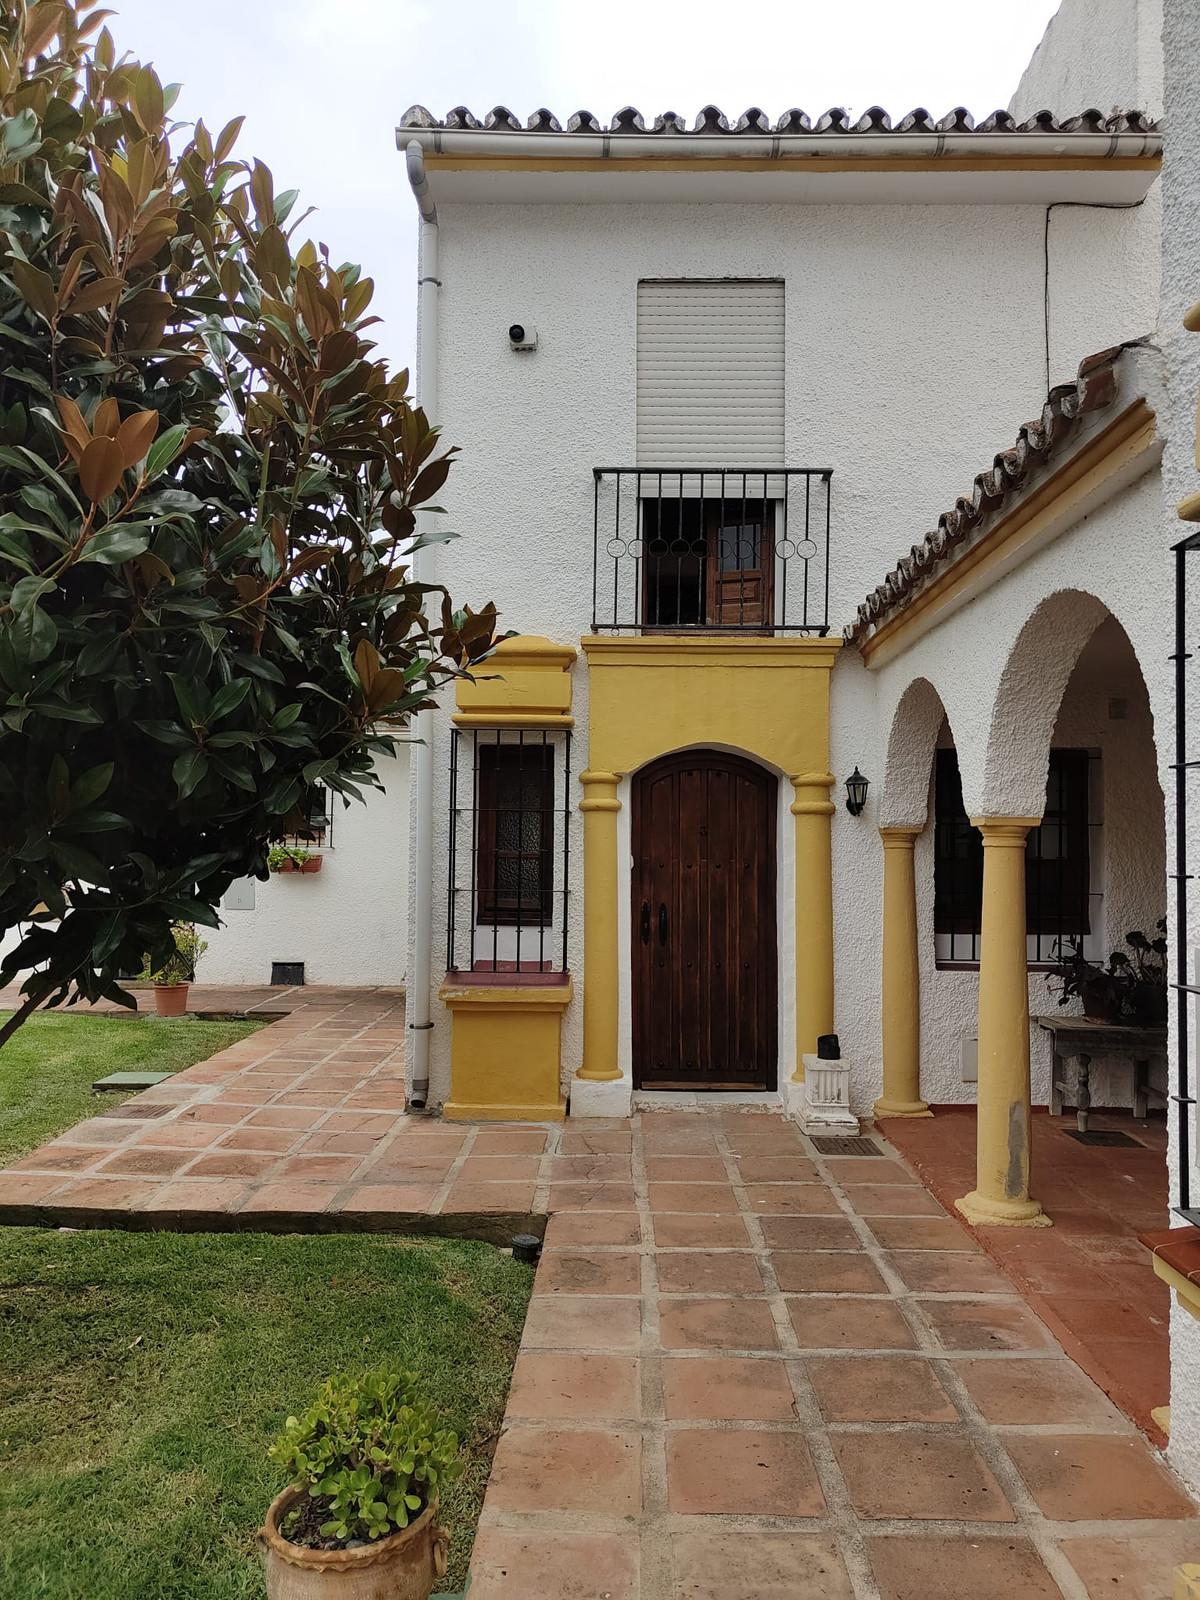 2 Bedroom Townhouse For Sale Elviria, Costa del Sol - HP3908254